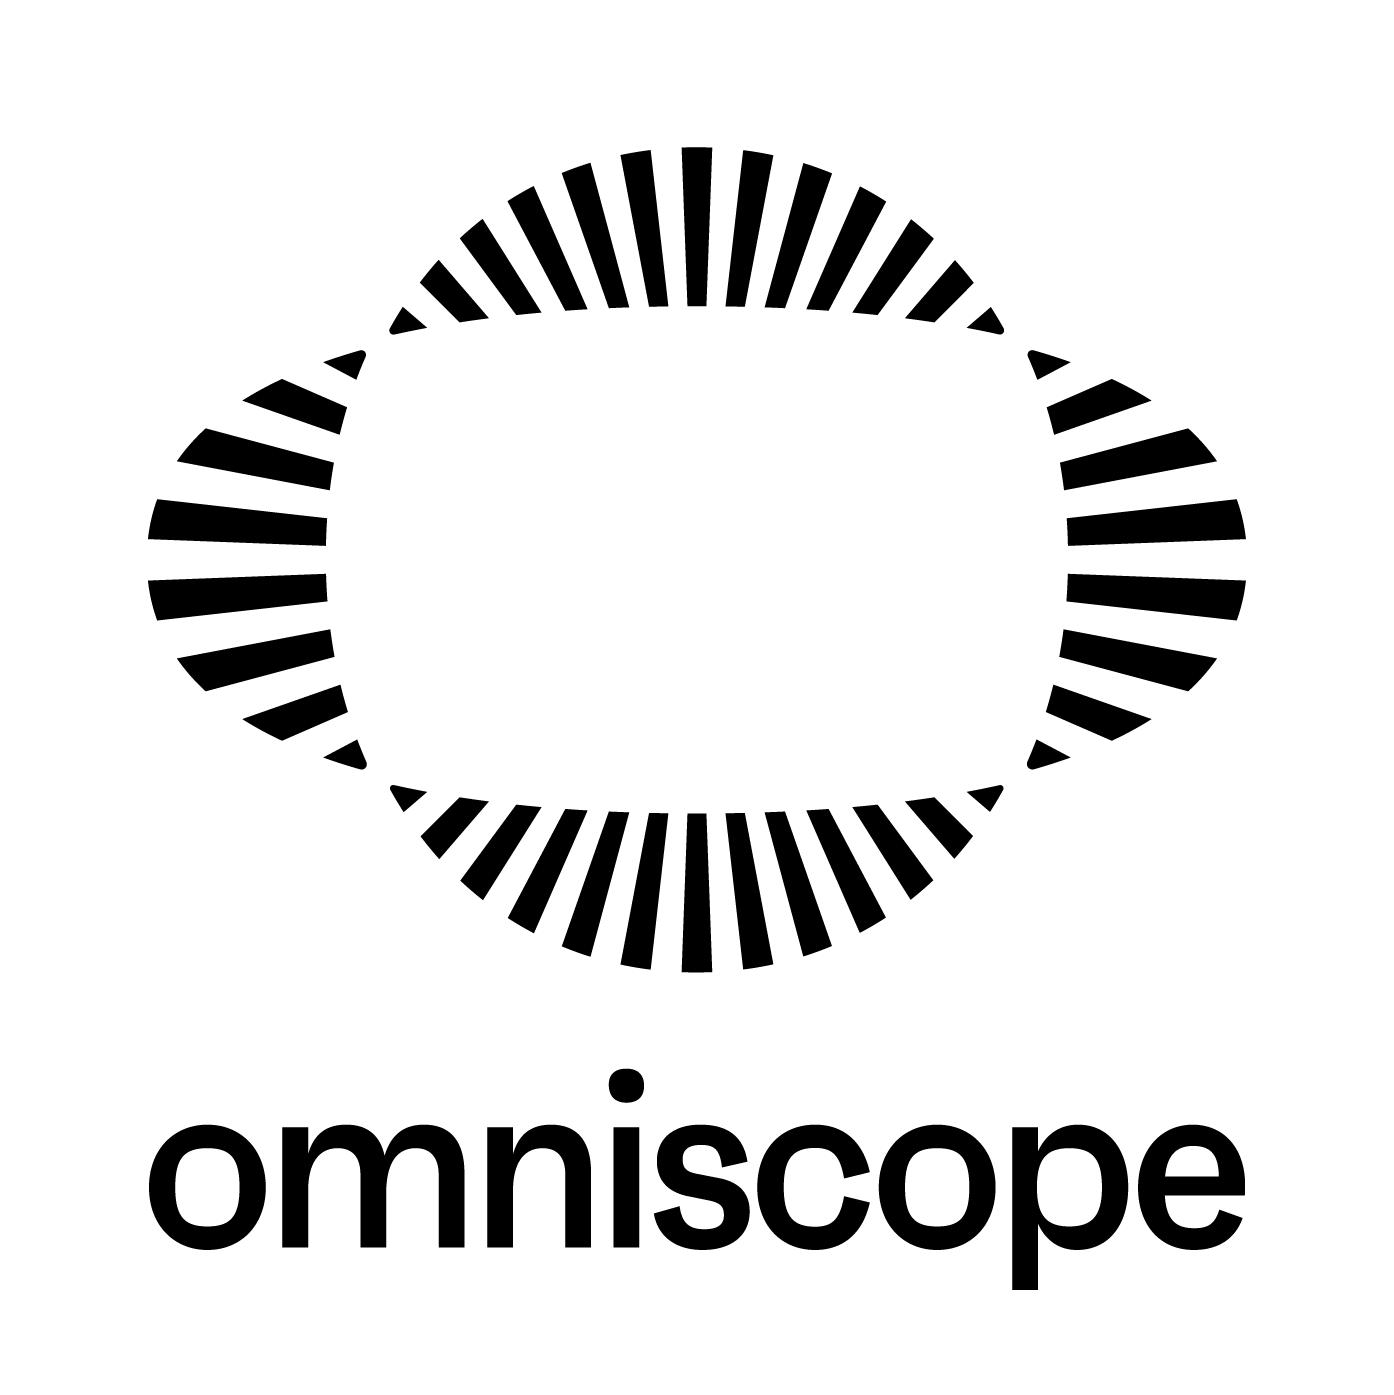 Omniscope